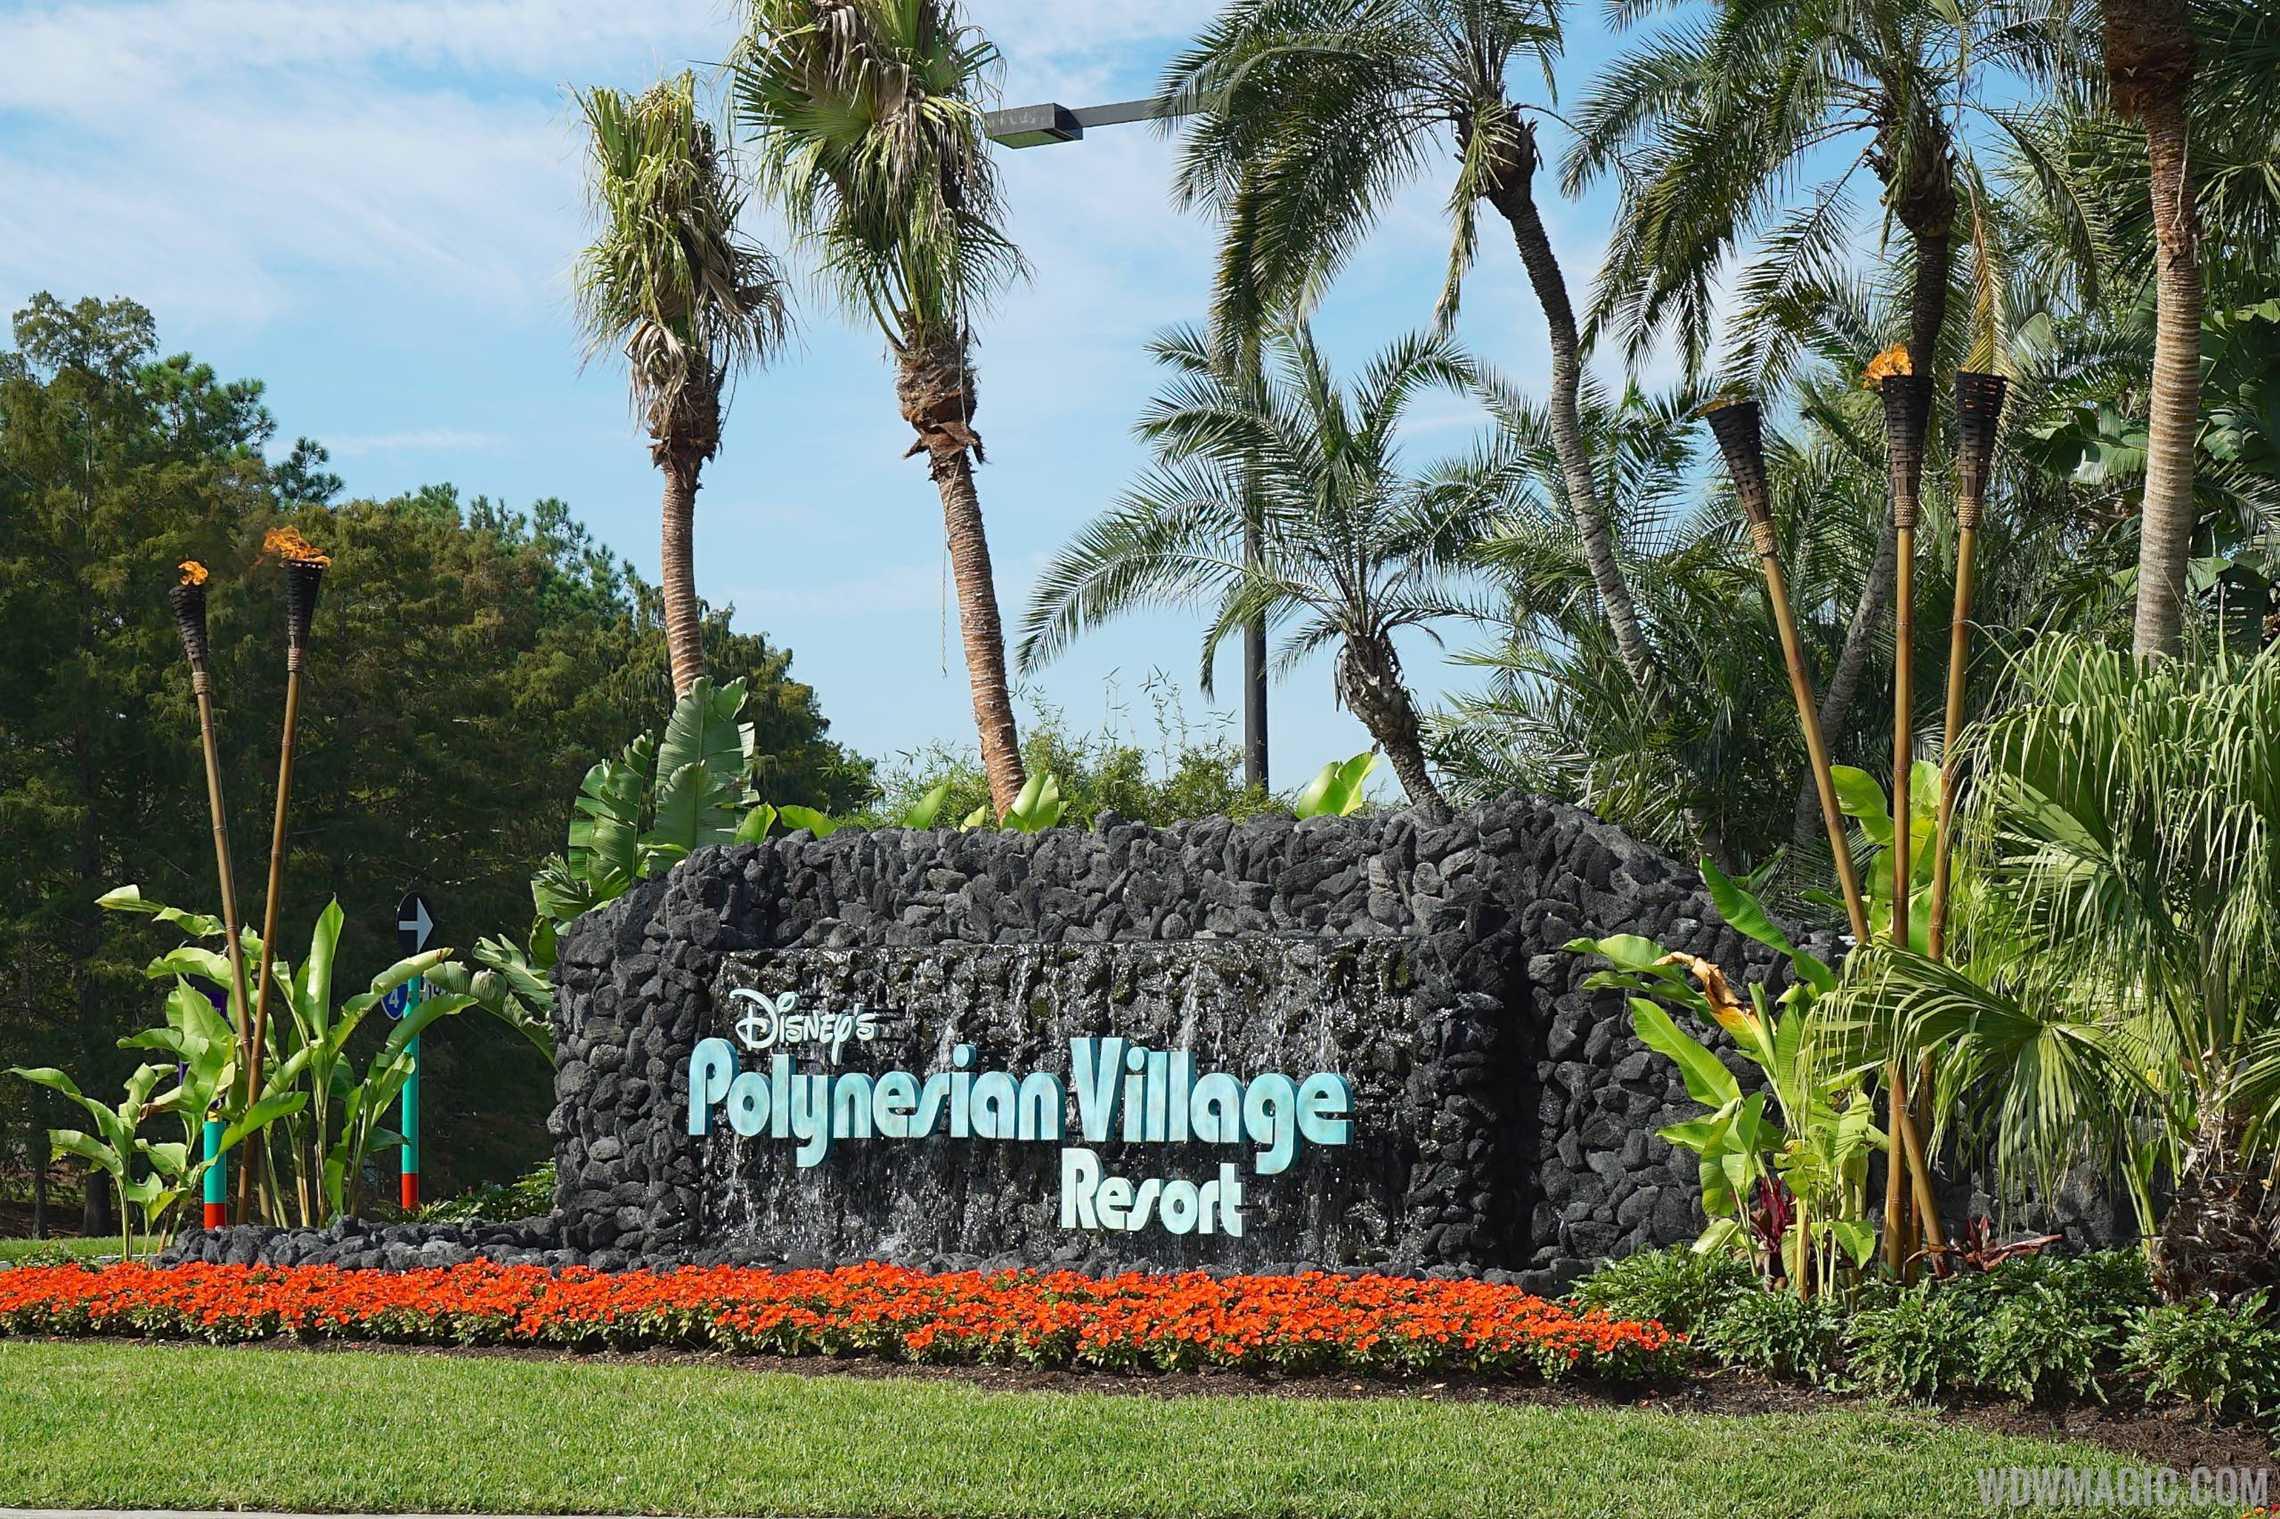 Polynesian Village Resort main entrance sign - Photo 1 of 3